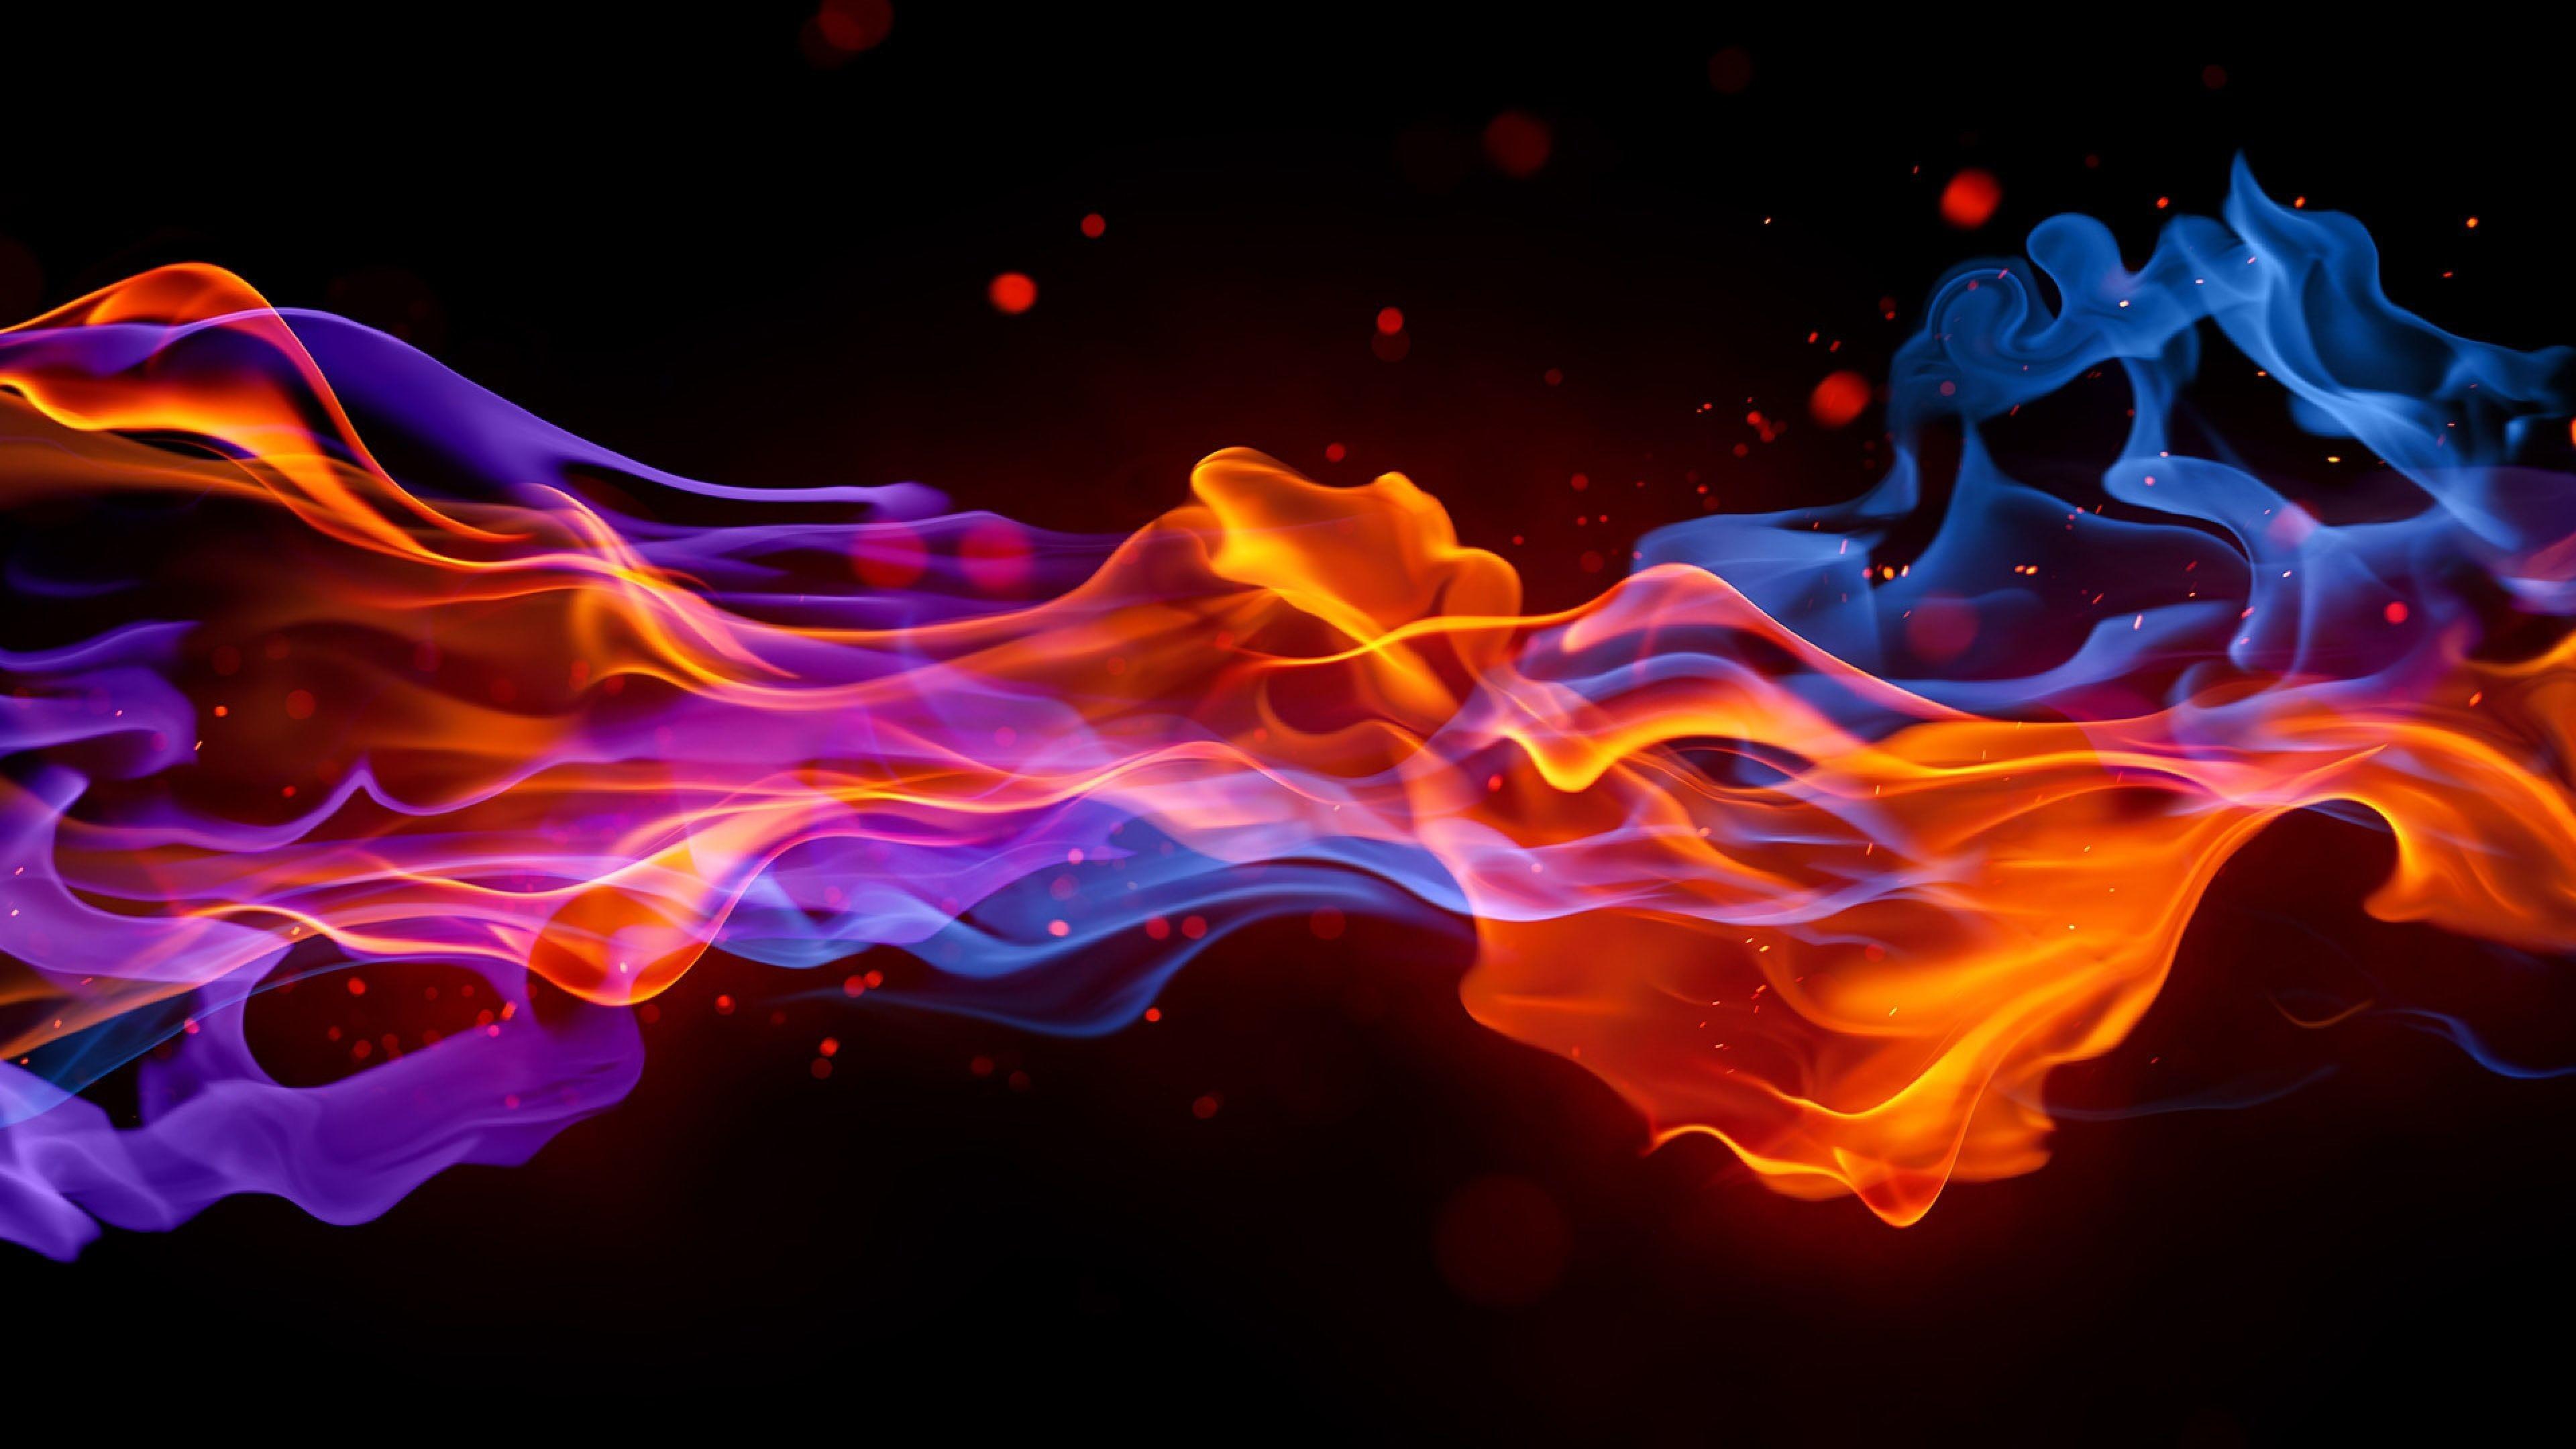 Colored Smoke Wallpapers